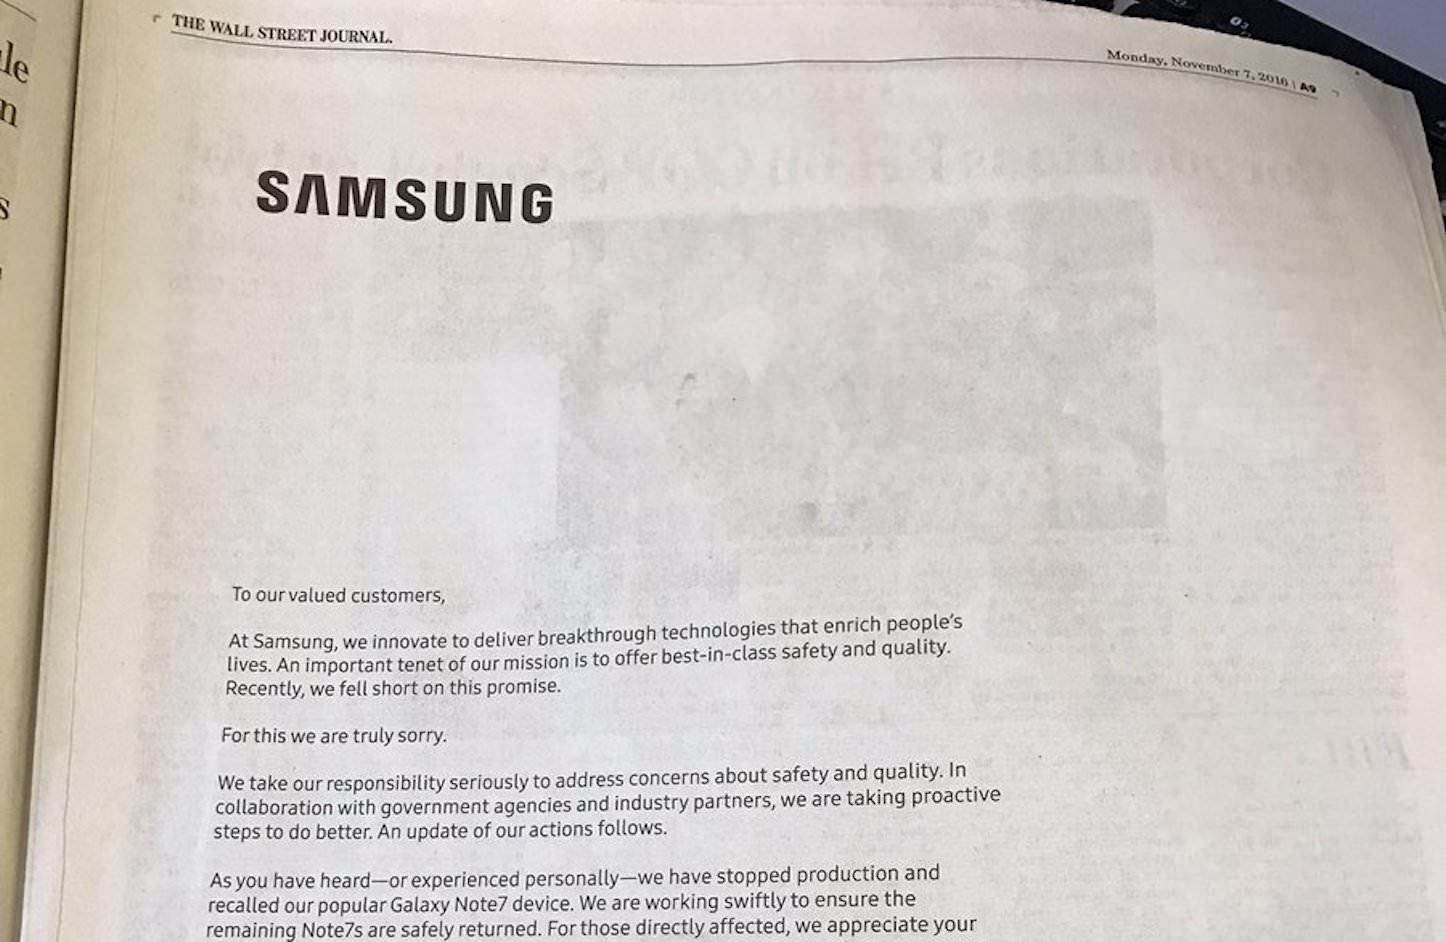 Samsung WSJ Ads